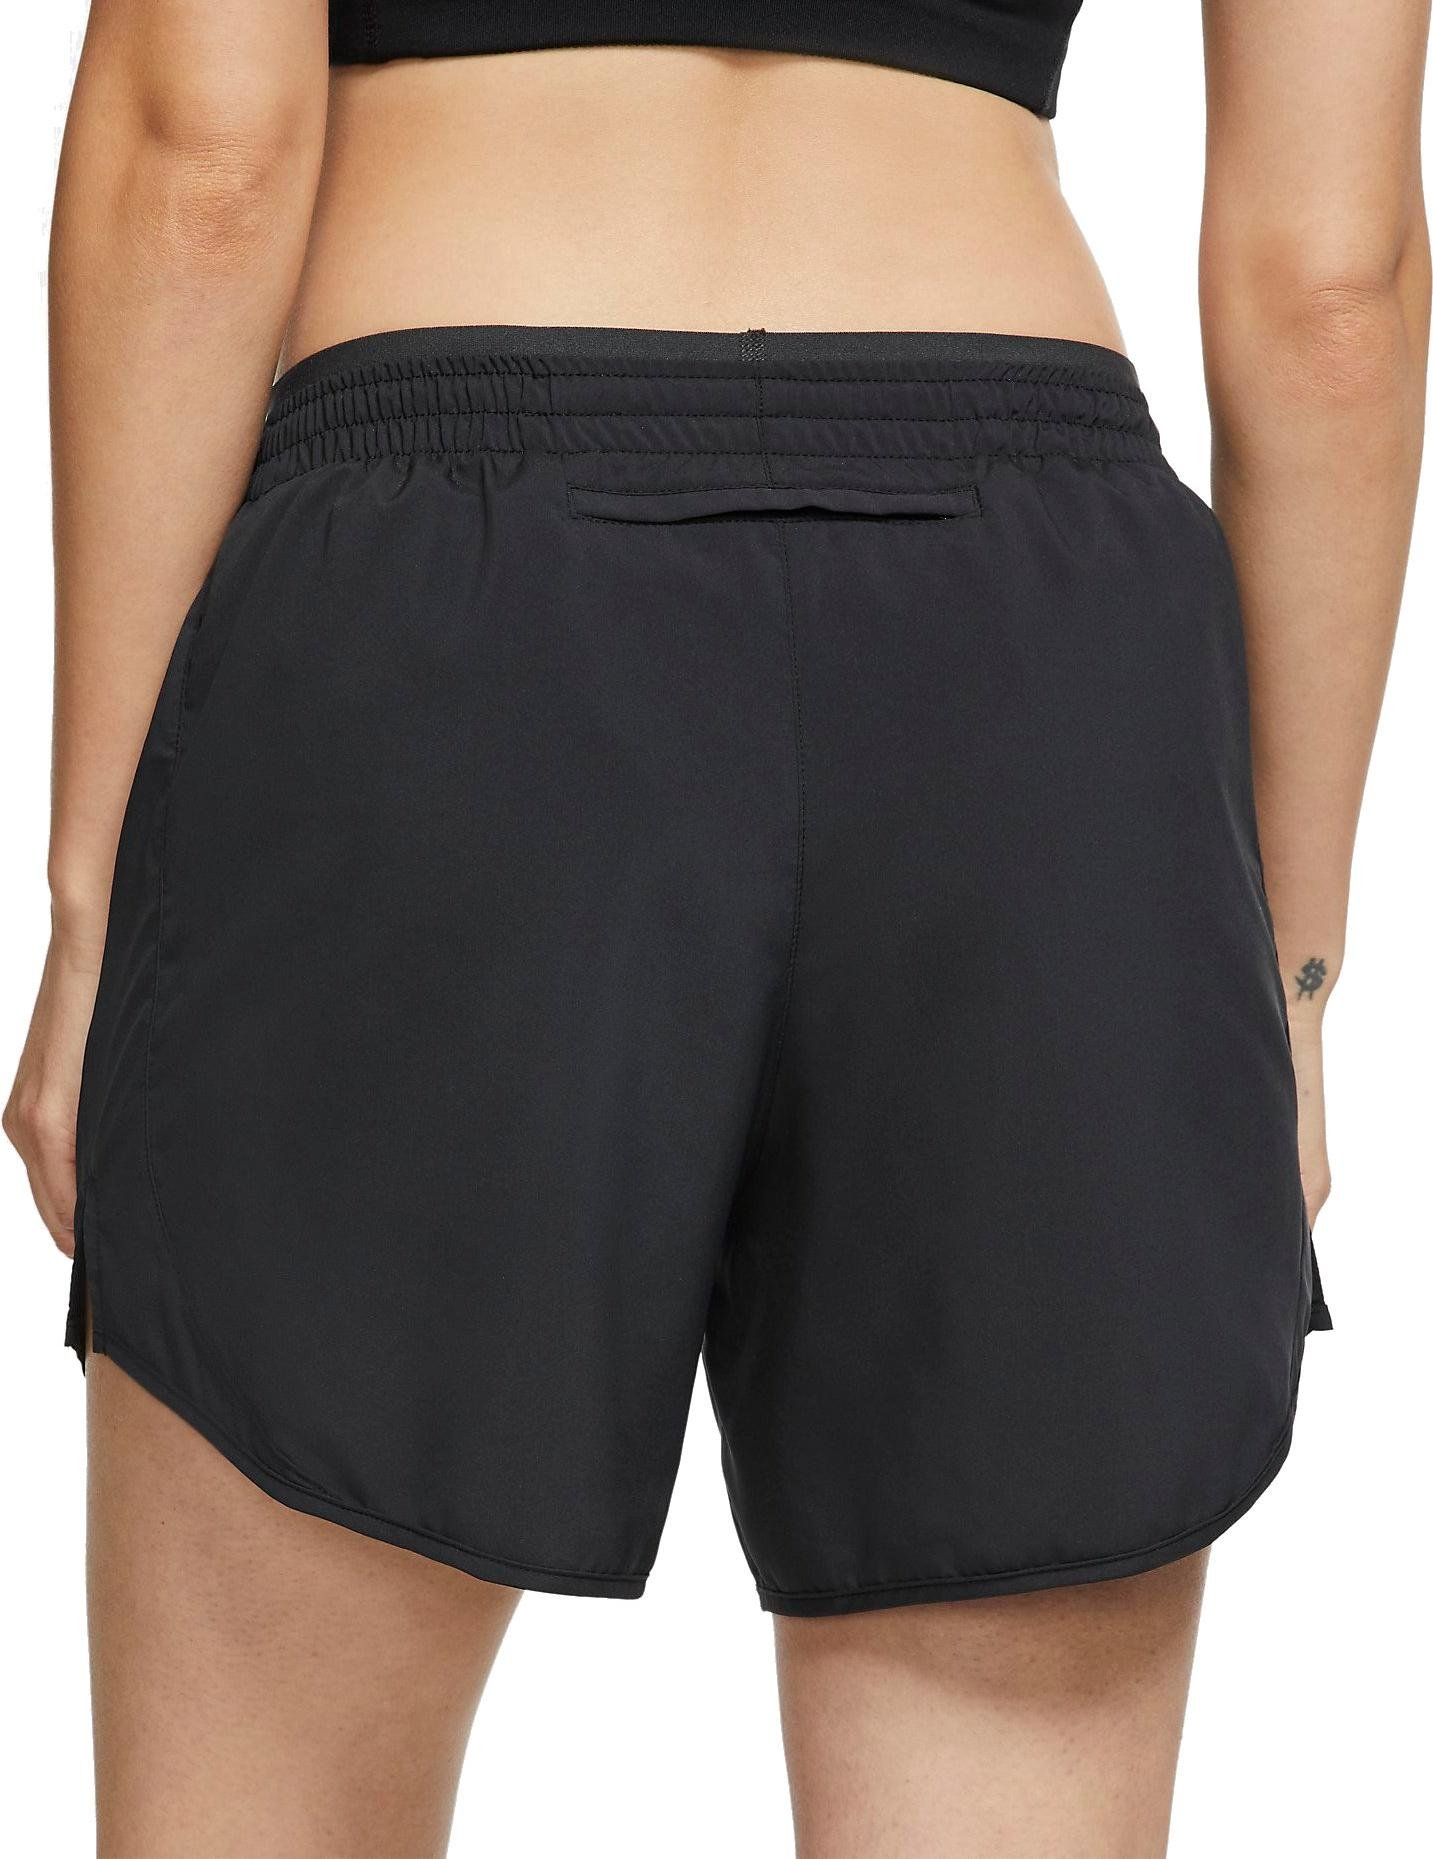 Mujer S NIKE W Nk Tempo LX Short 3in Pantalones Cortos de Deporte Black//Anthracite// Reflective silv